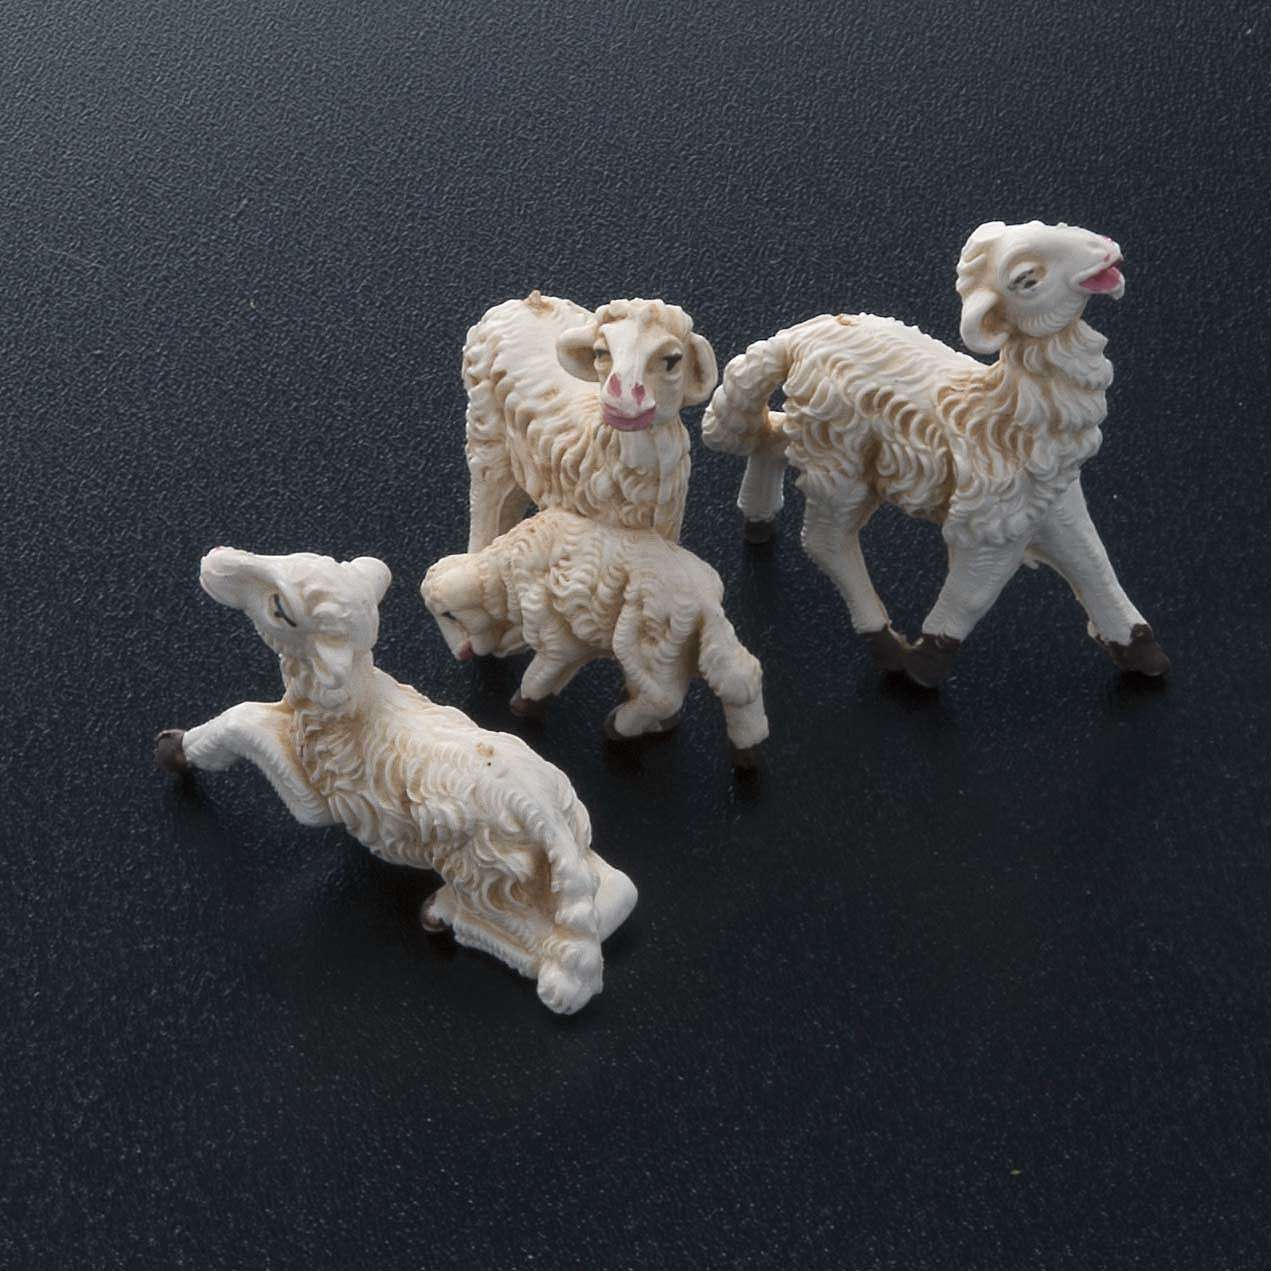 Nativity scene figurines, sheep 10 pieces 8 cm 3